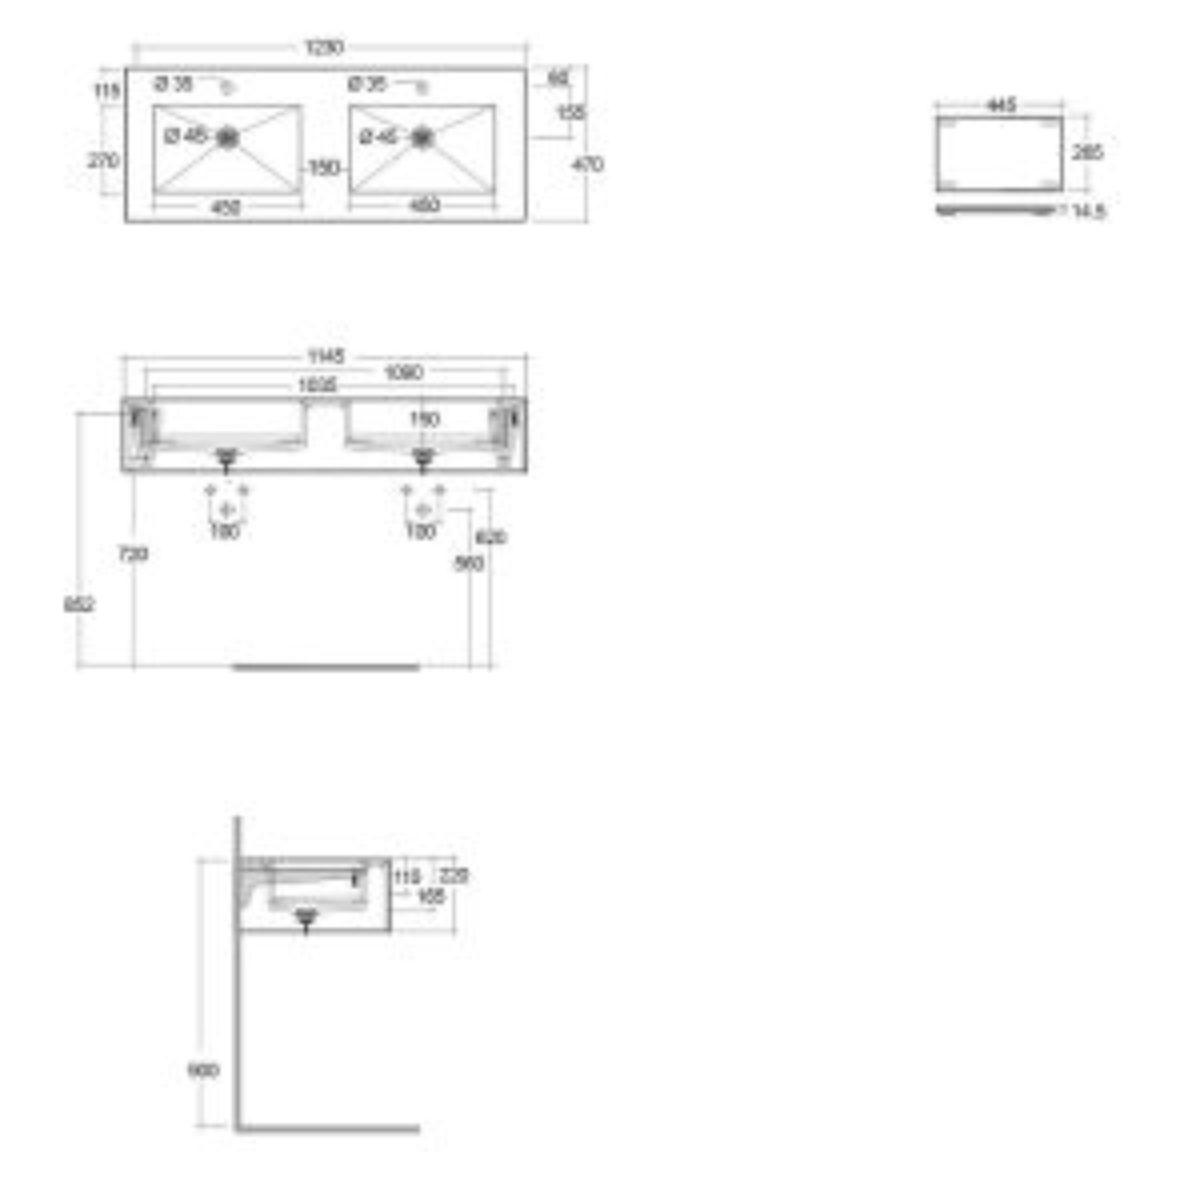 RAK Precious Uni Dark Black Wall Hung Counter Basin 1200mm with Brackets Measurements